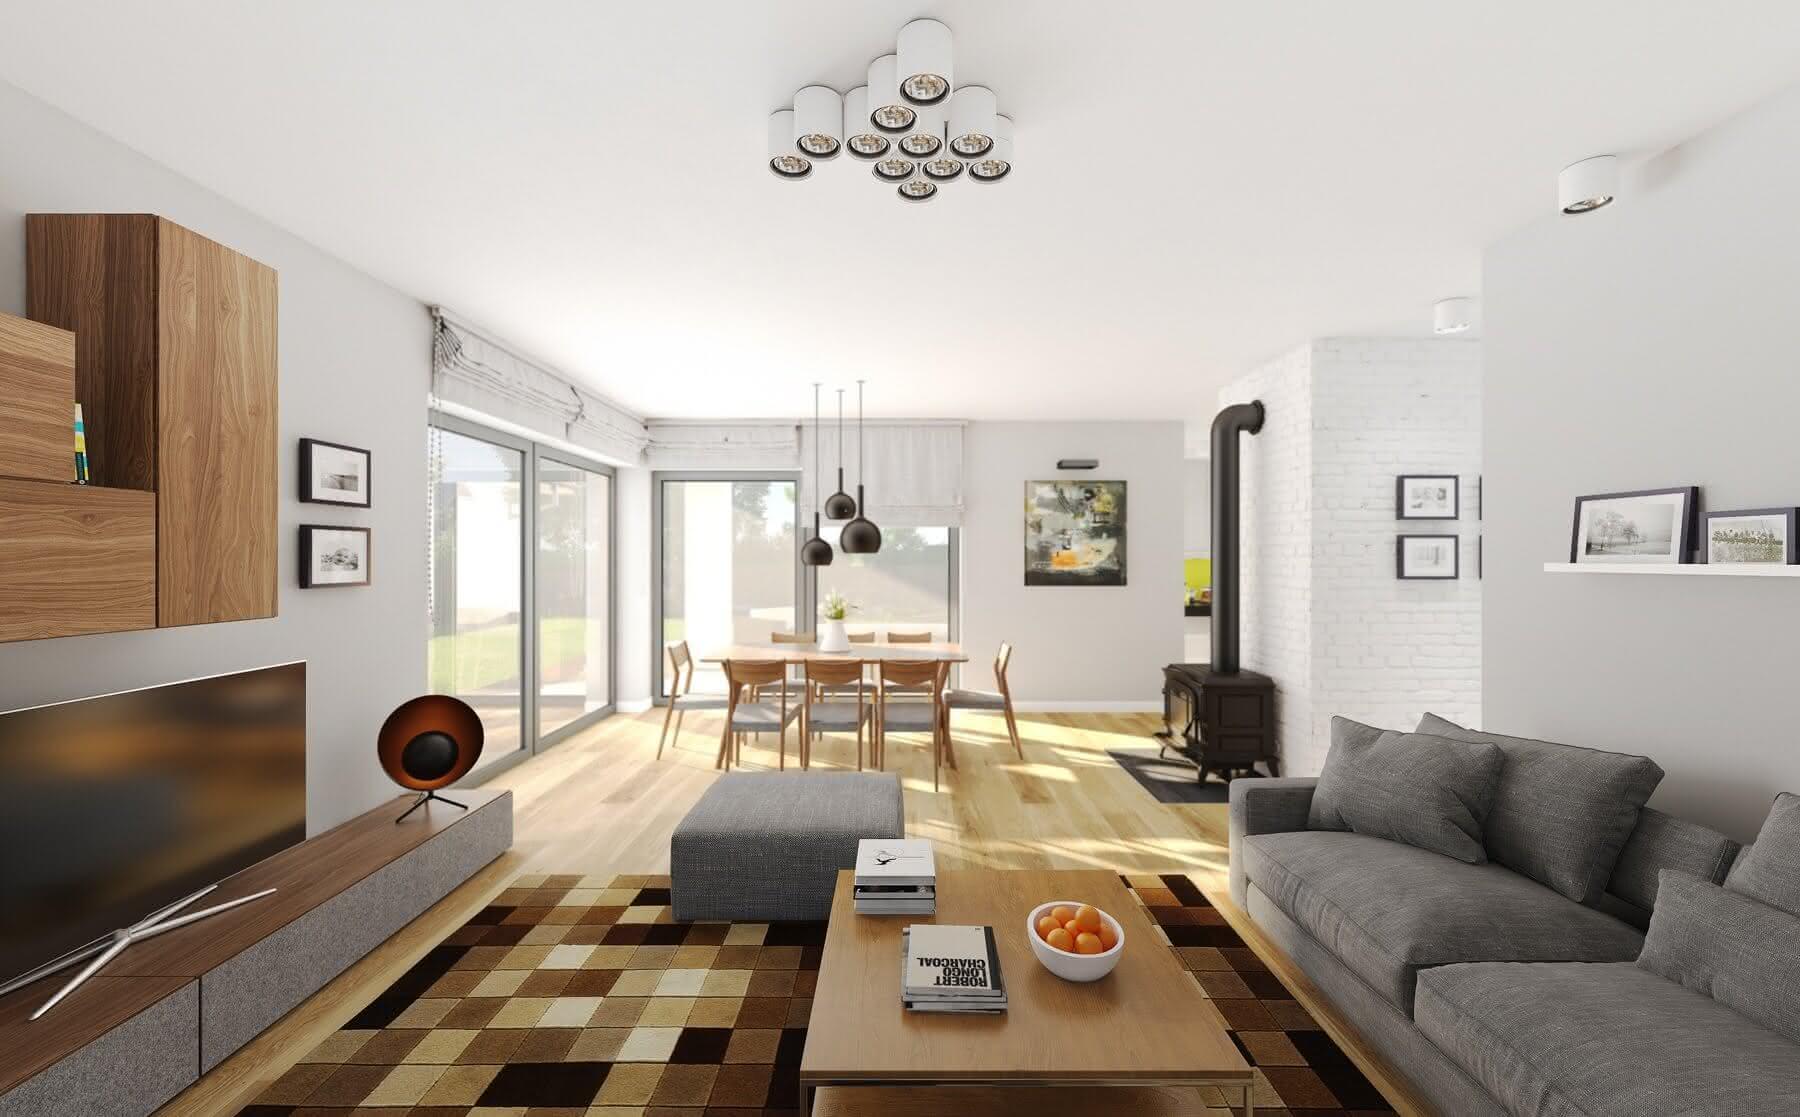 projekt-domu-London-6-j6mg1cc9.jpg